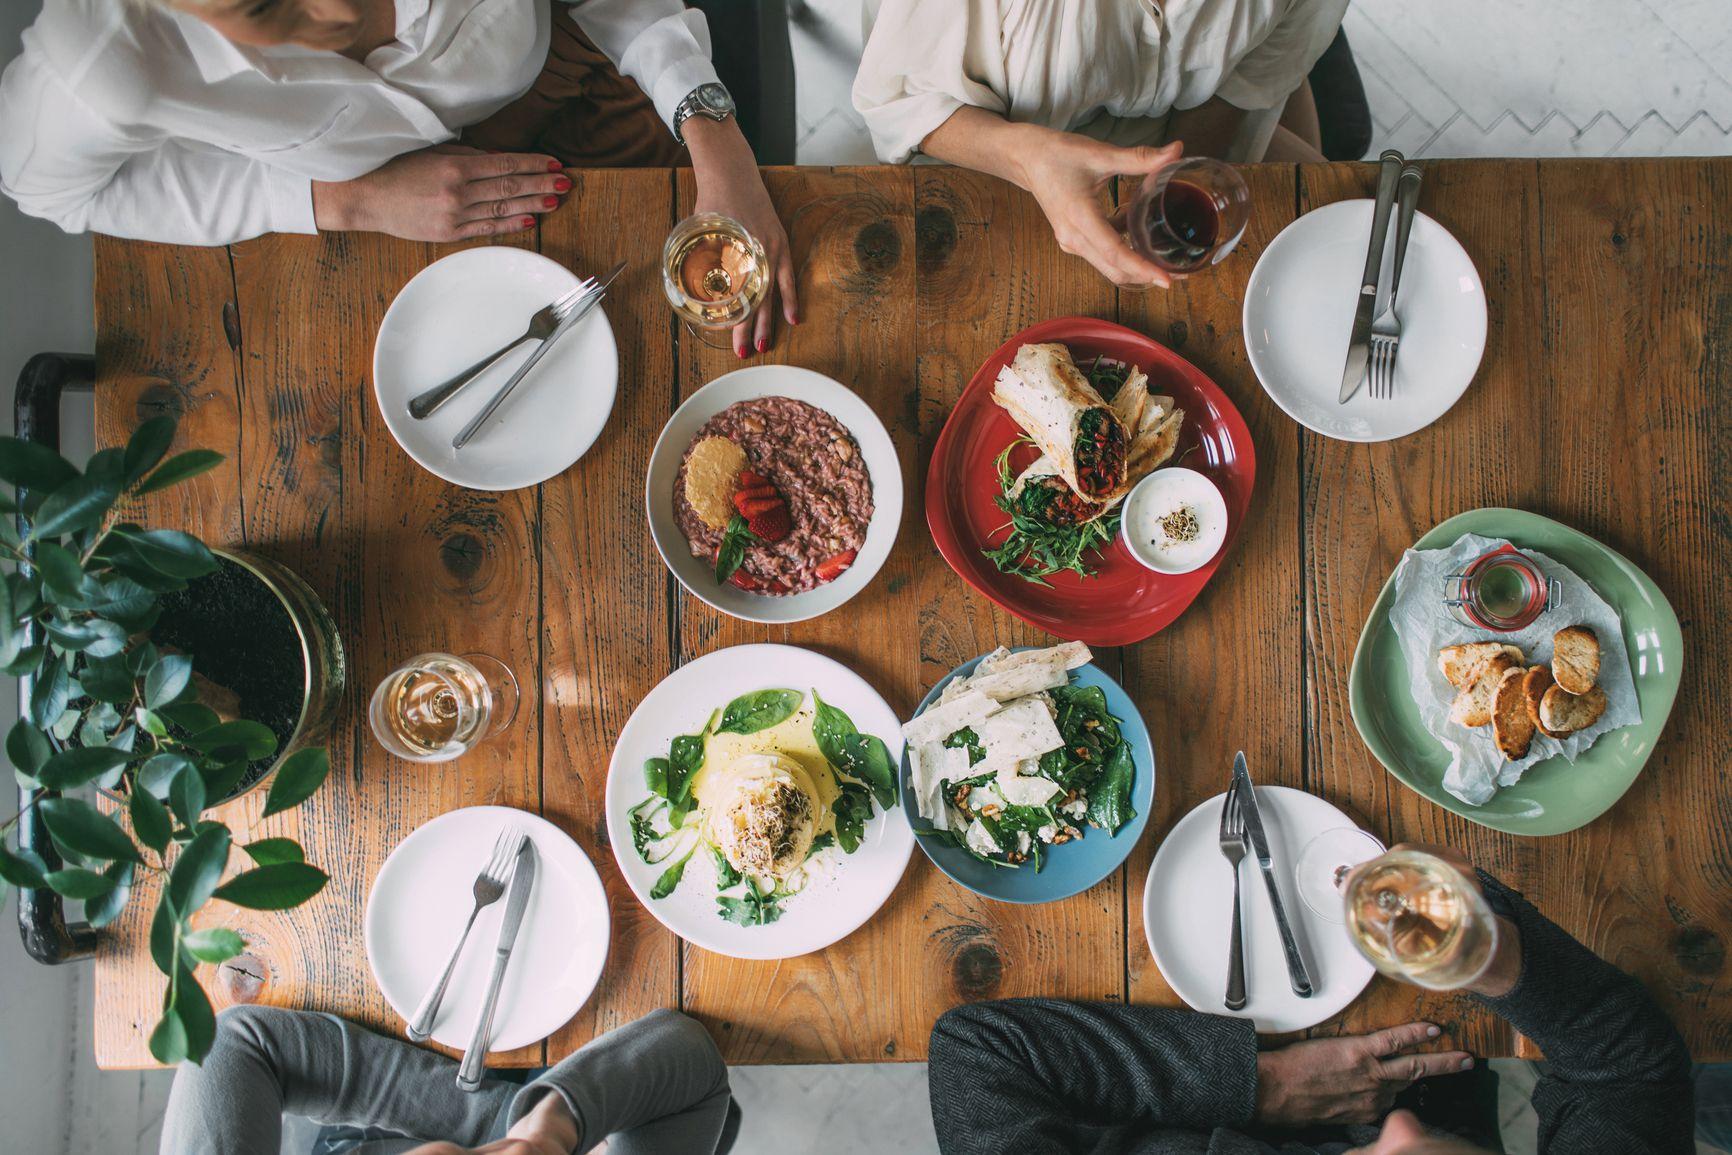 Tips on proper at. Dinner clipart dining etiquette